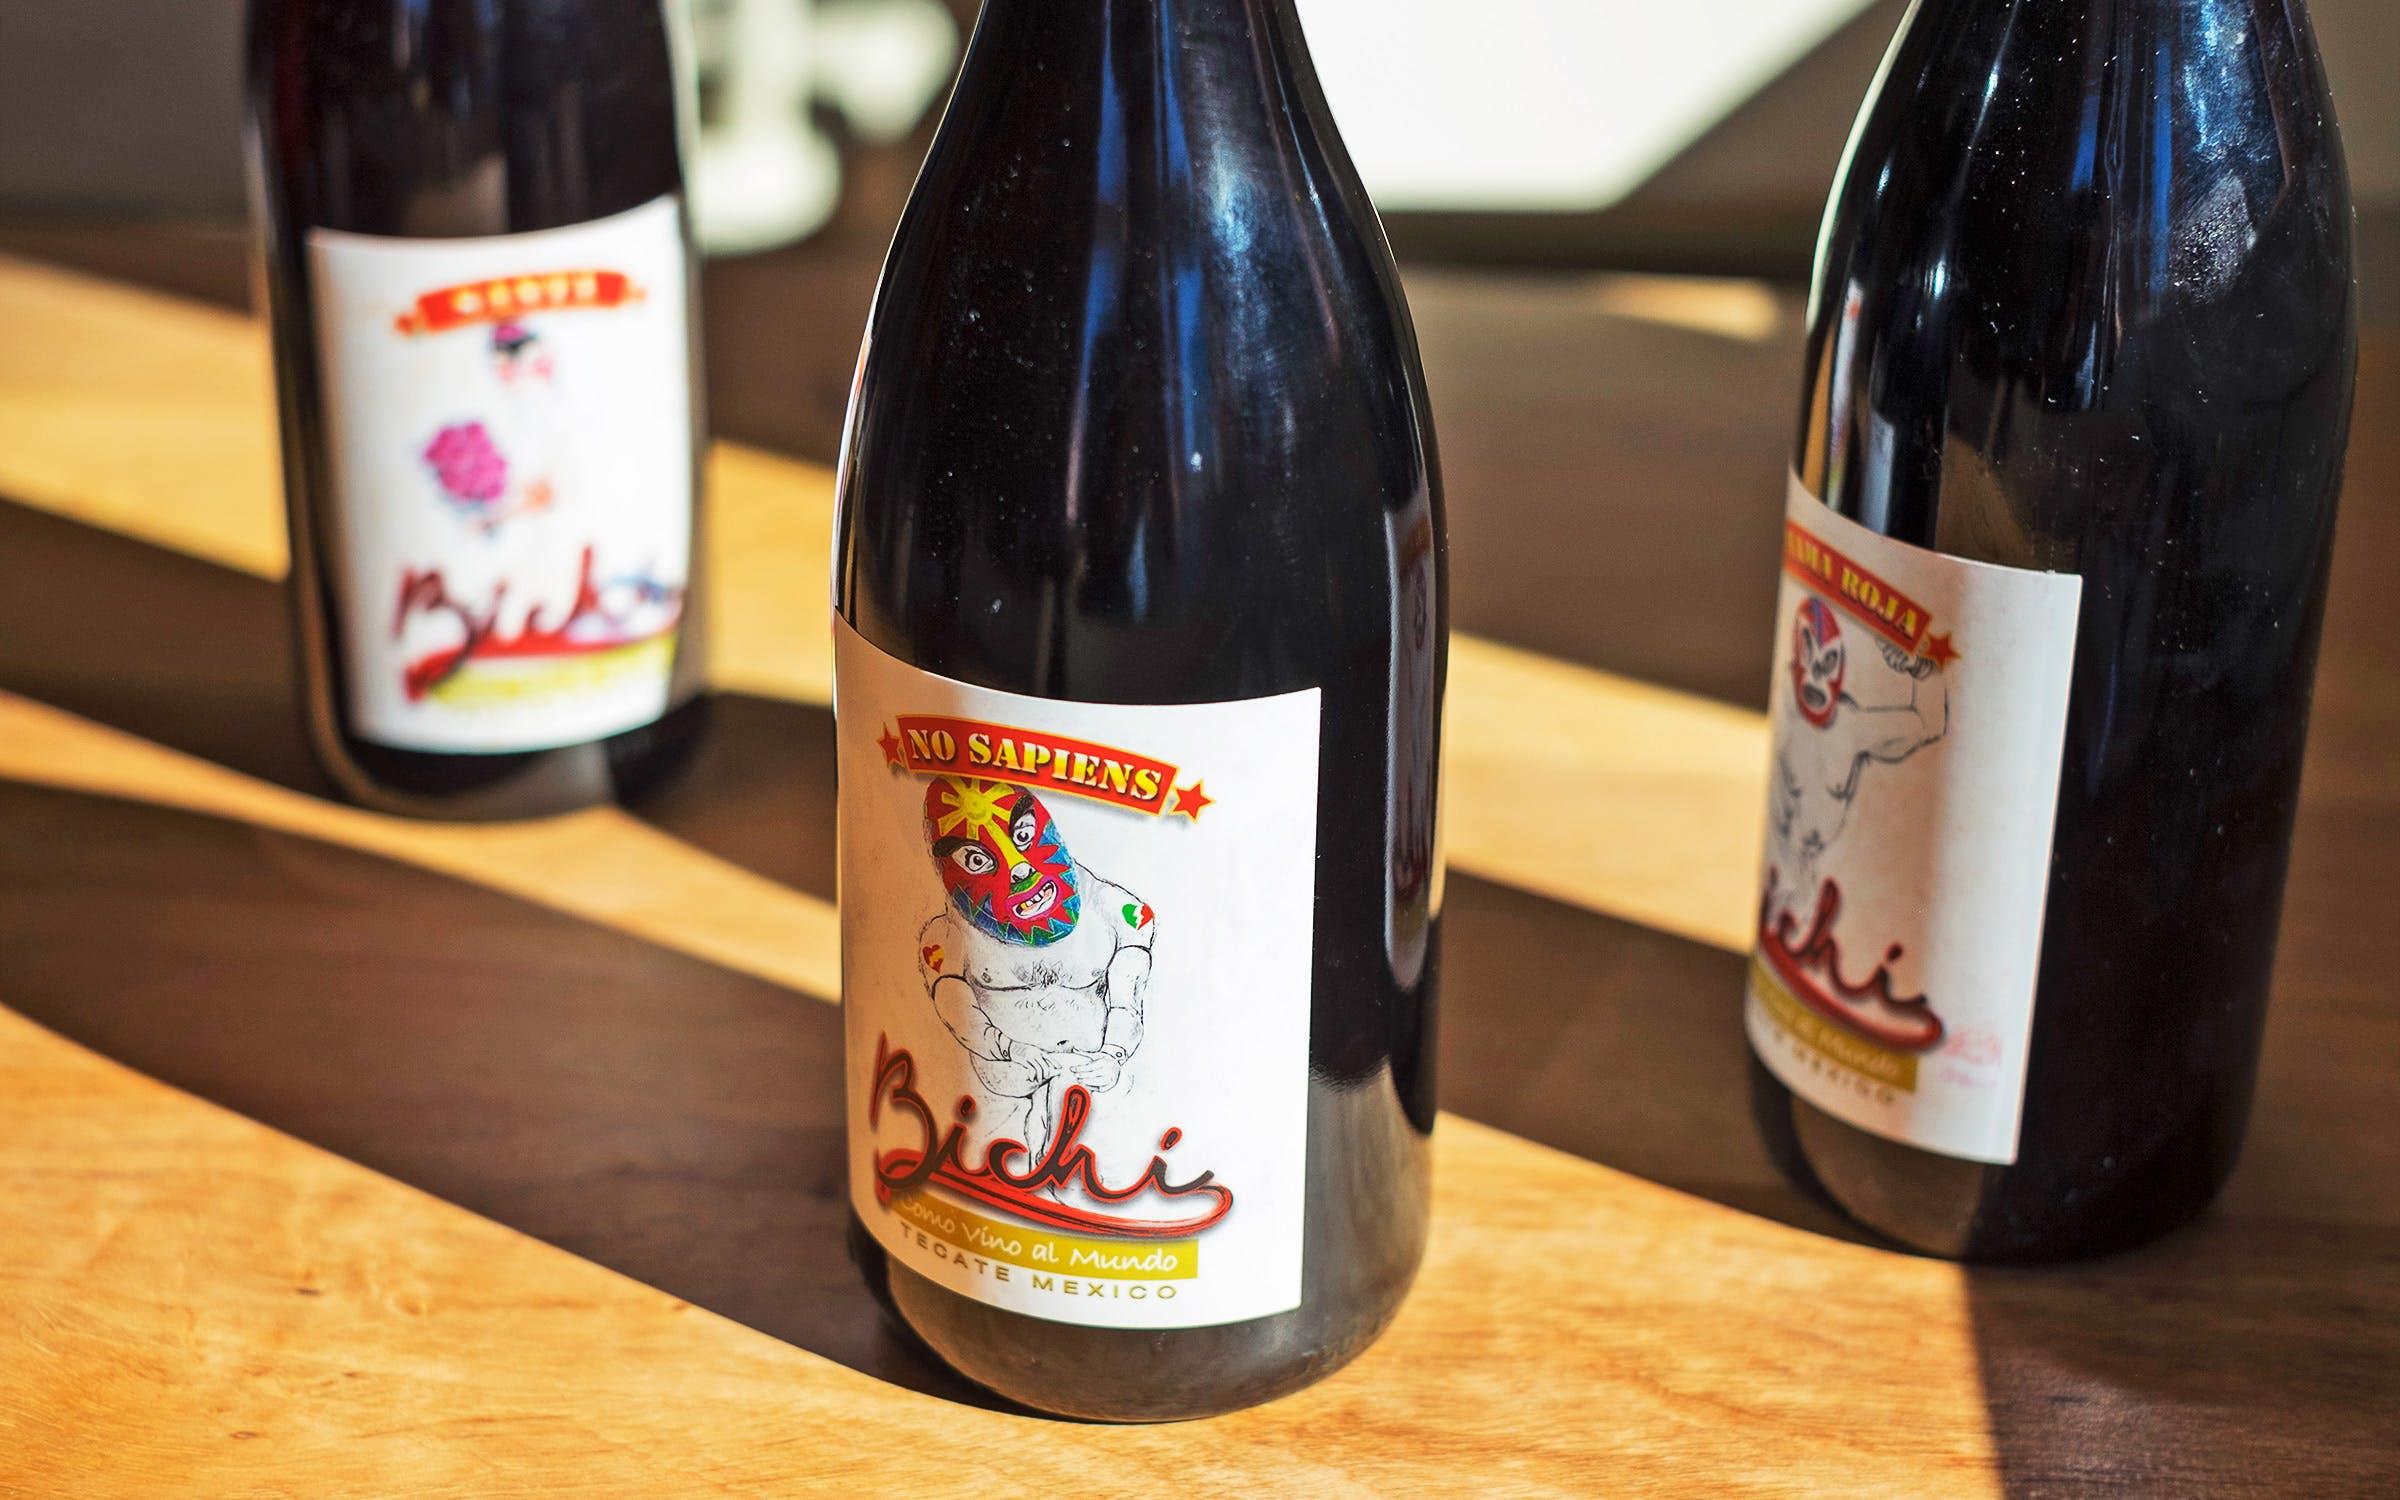 suerte-tacos-austin-bichi-wine